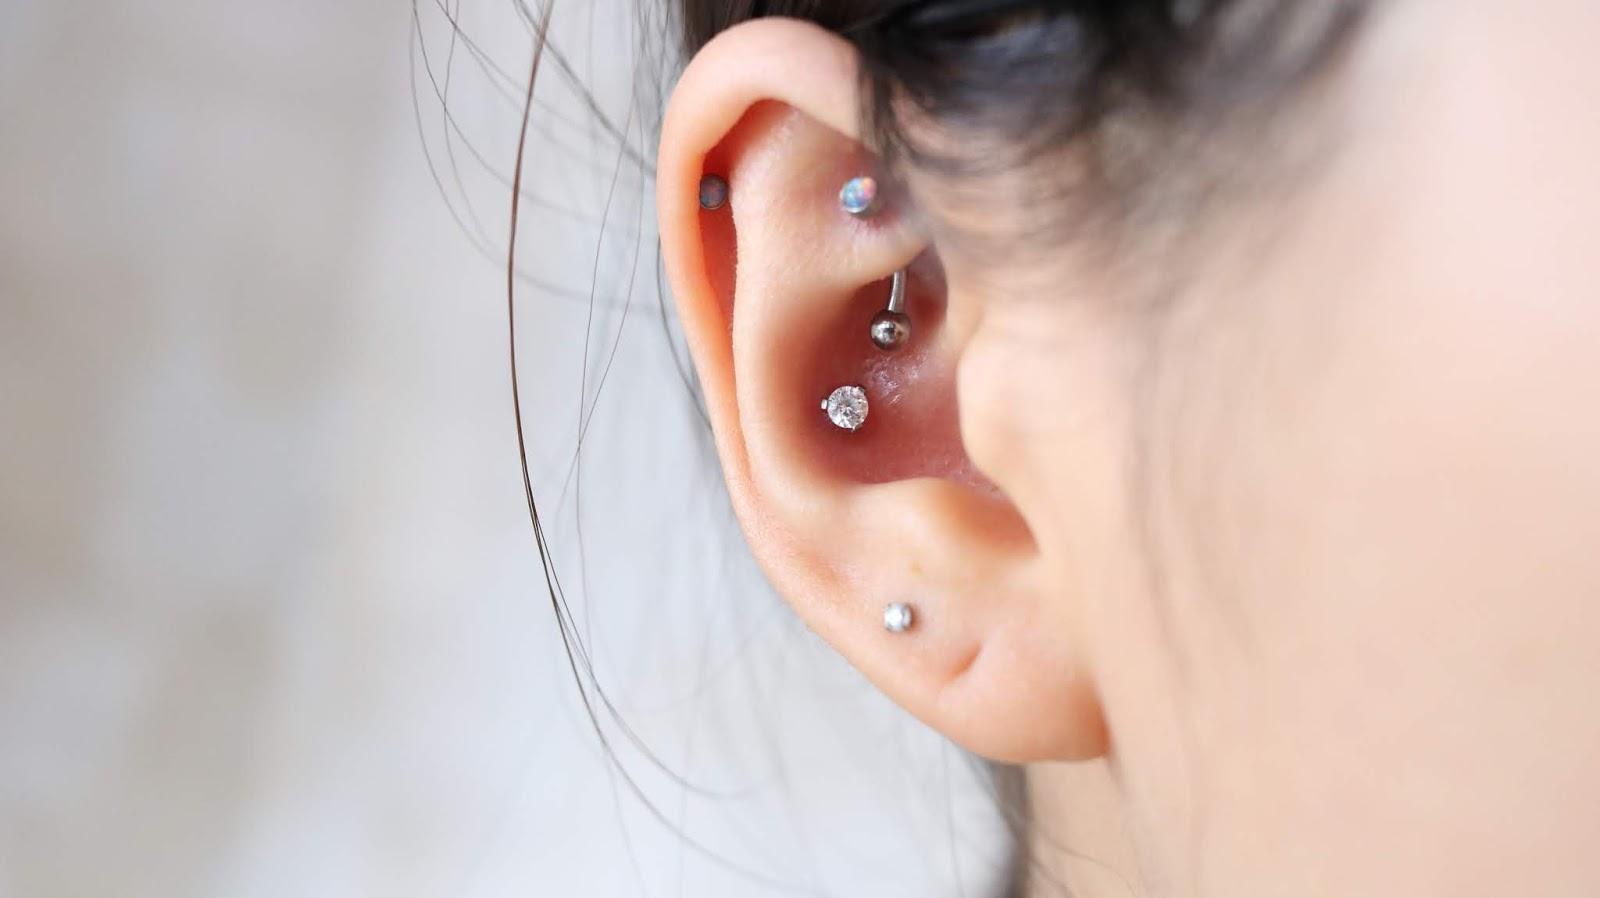 Maine Lyn S Reviews My Ear Piercings Experience